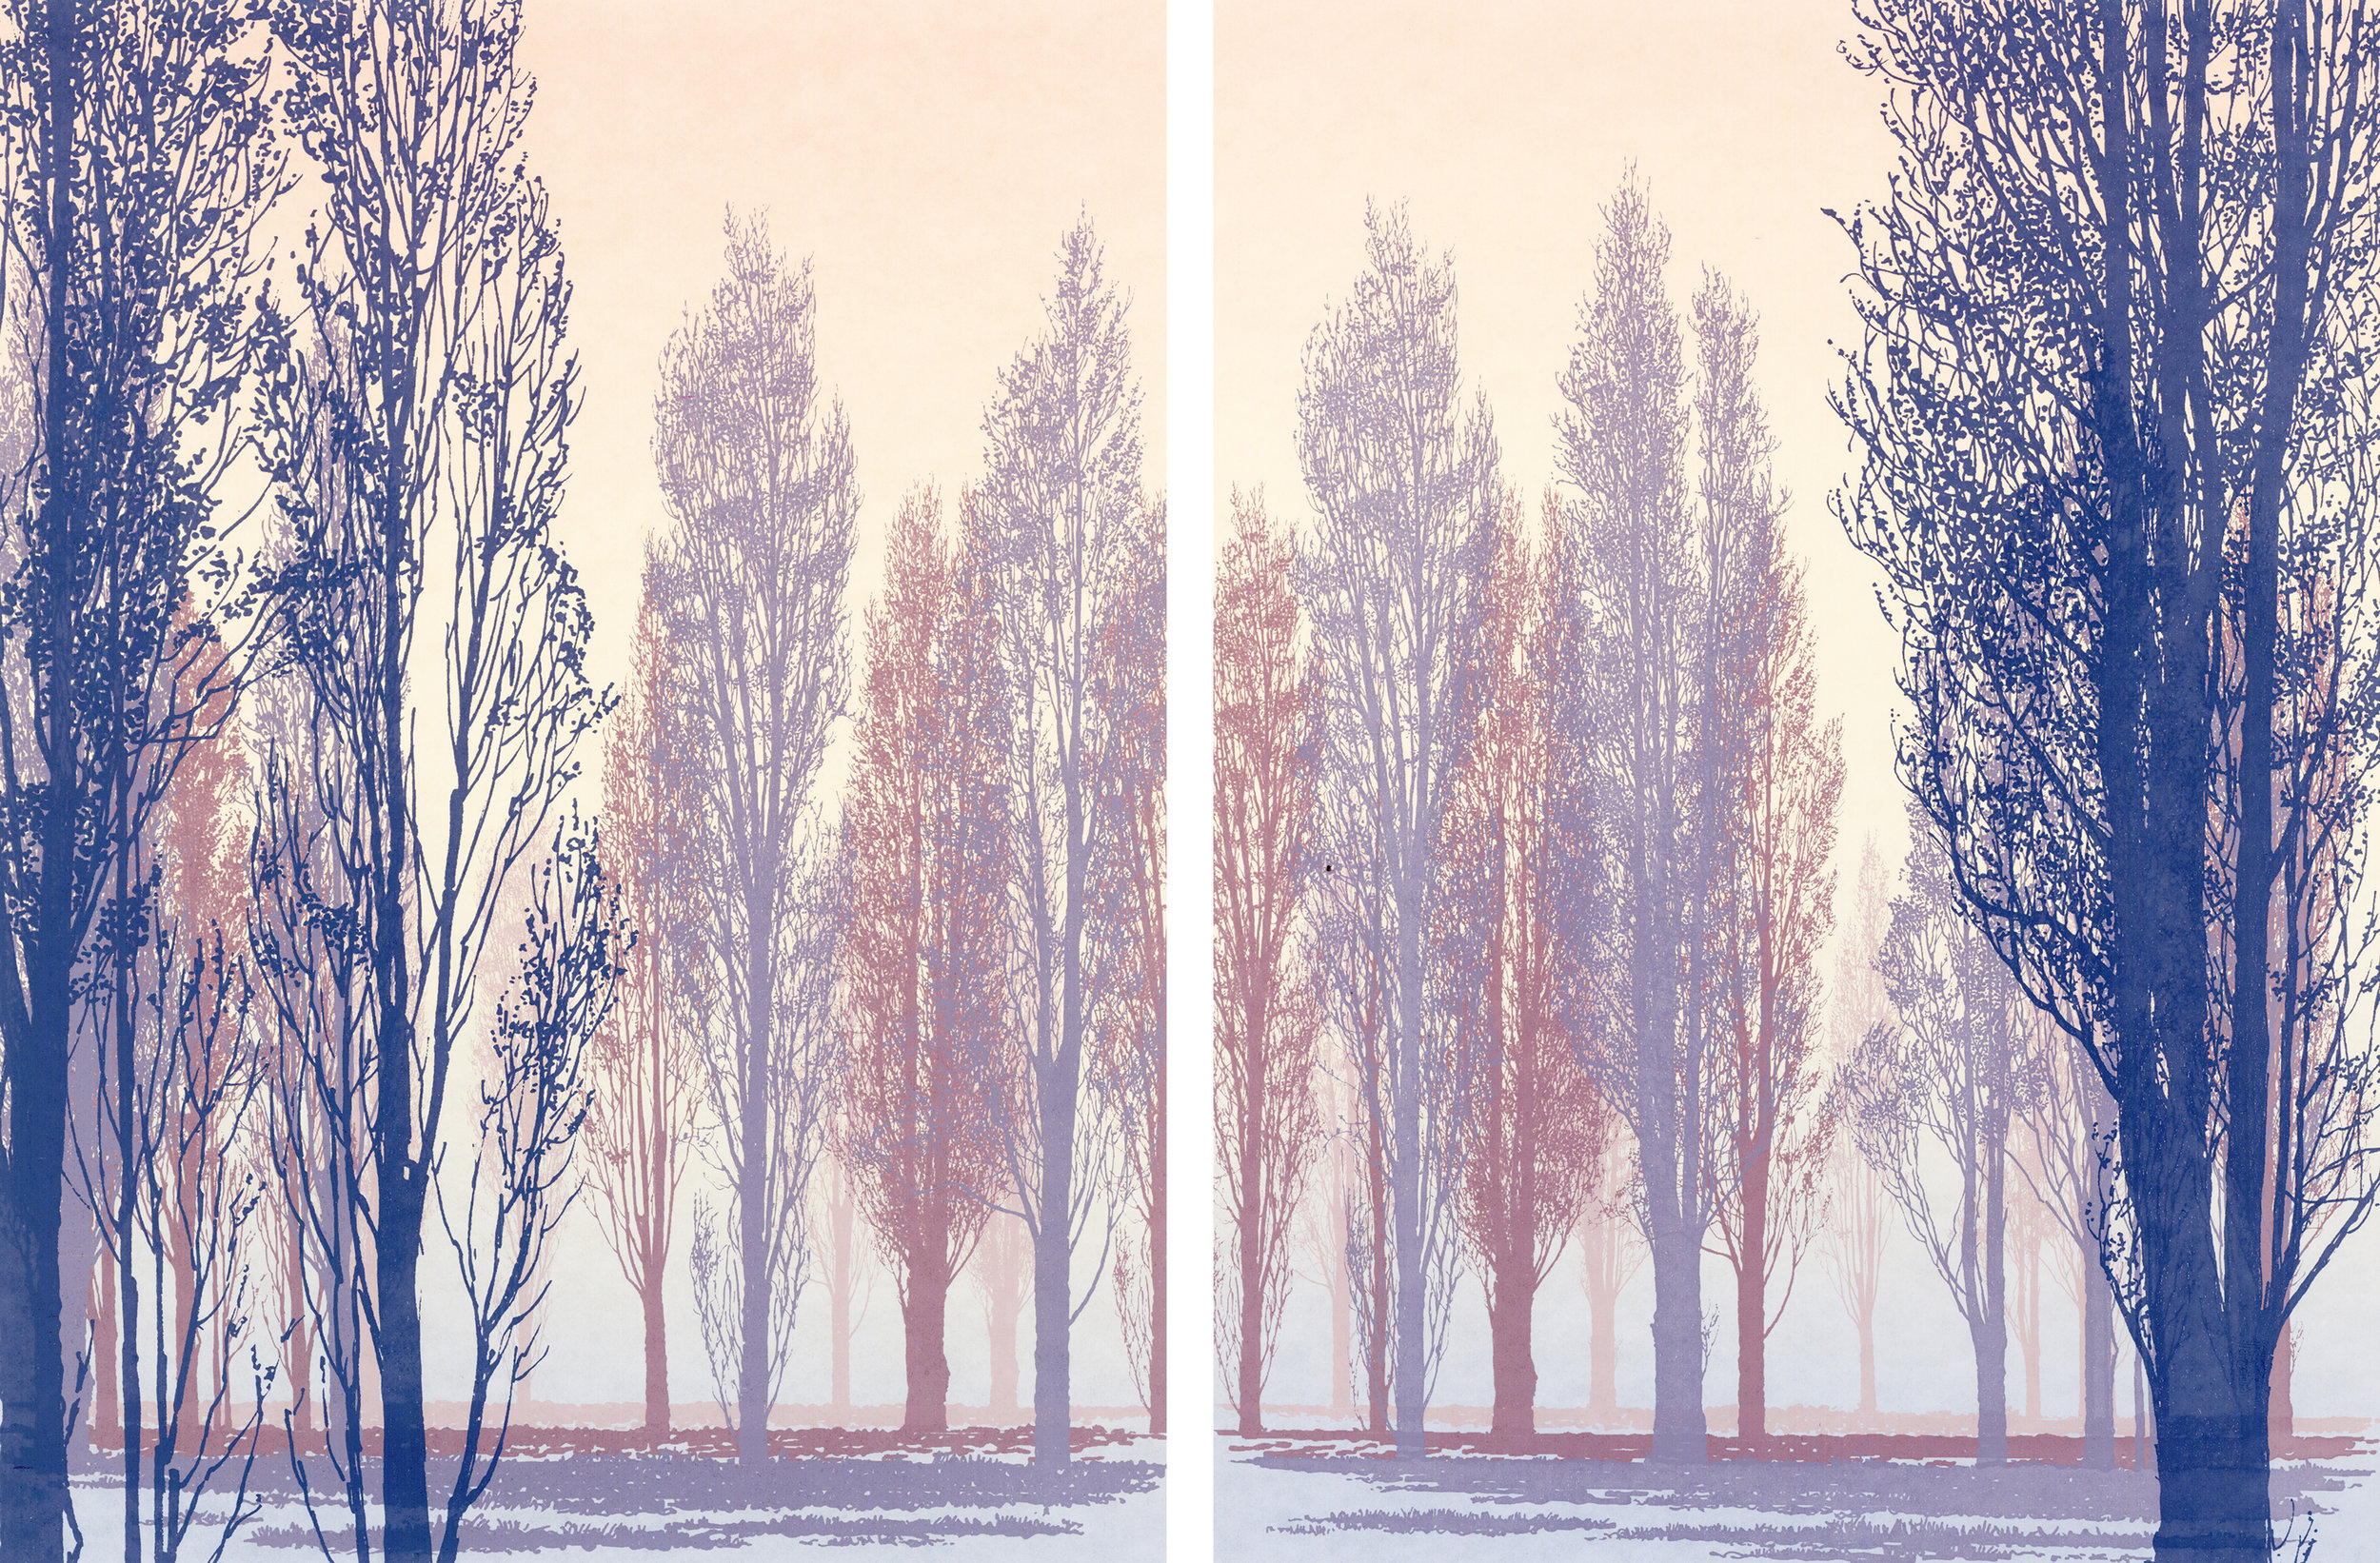 Poplars 1 and 2